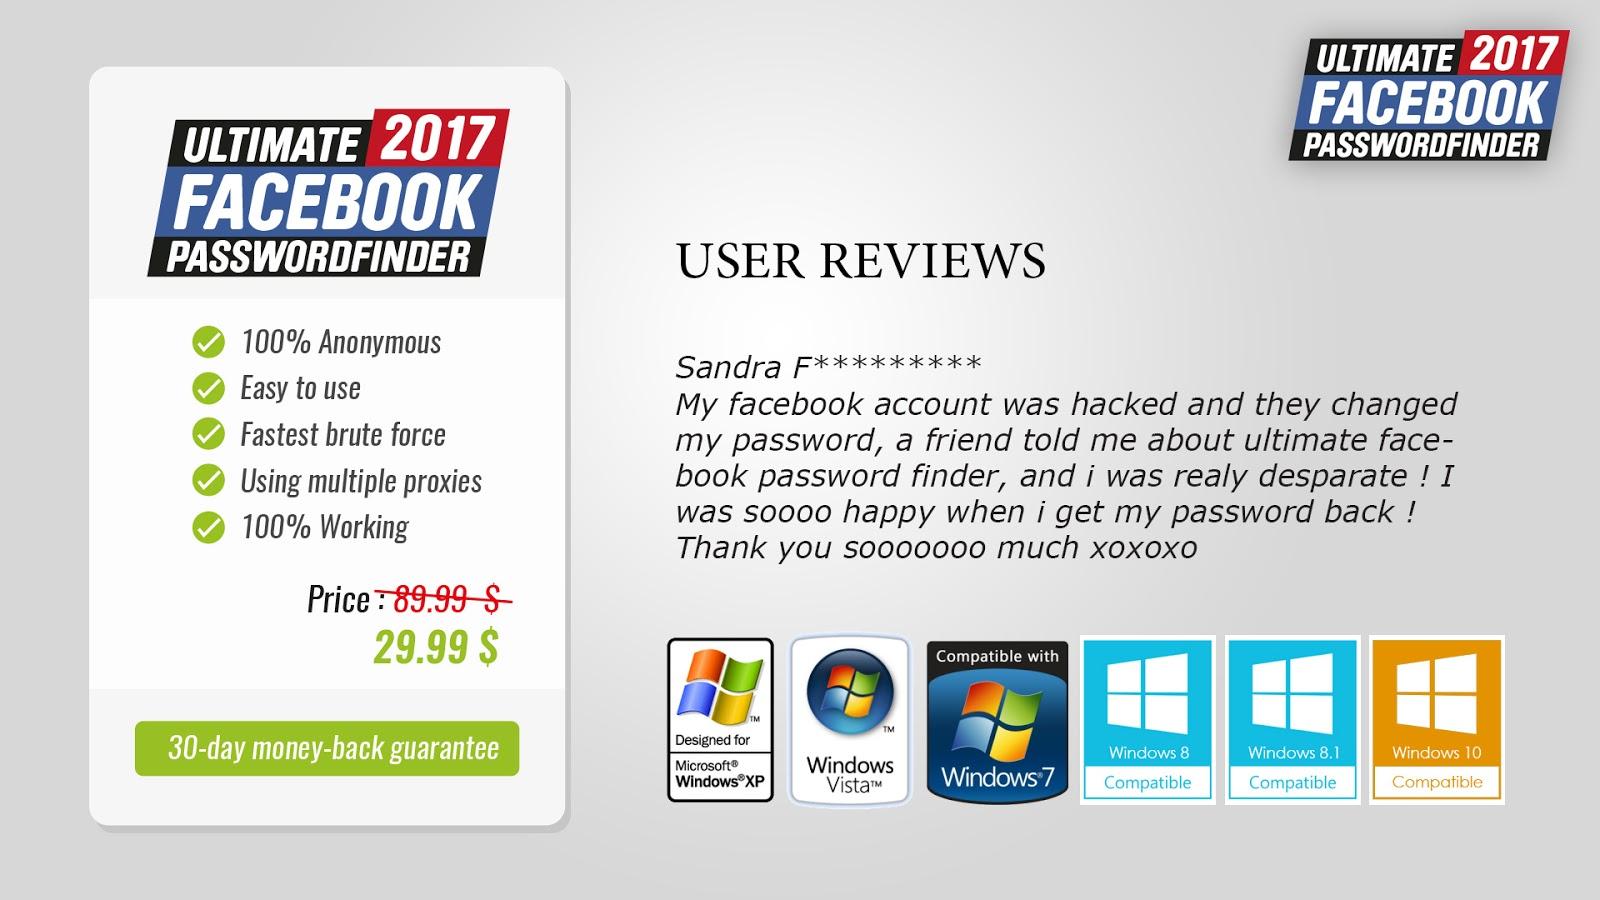 logiciel de piratage facebook ultimate by le blog du hacker